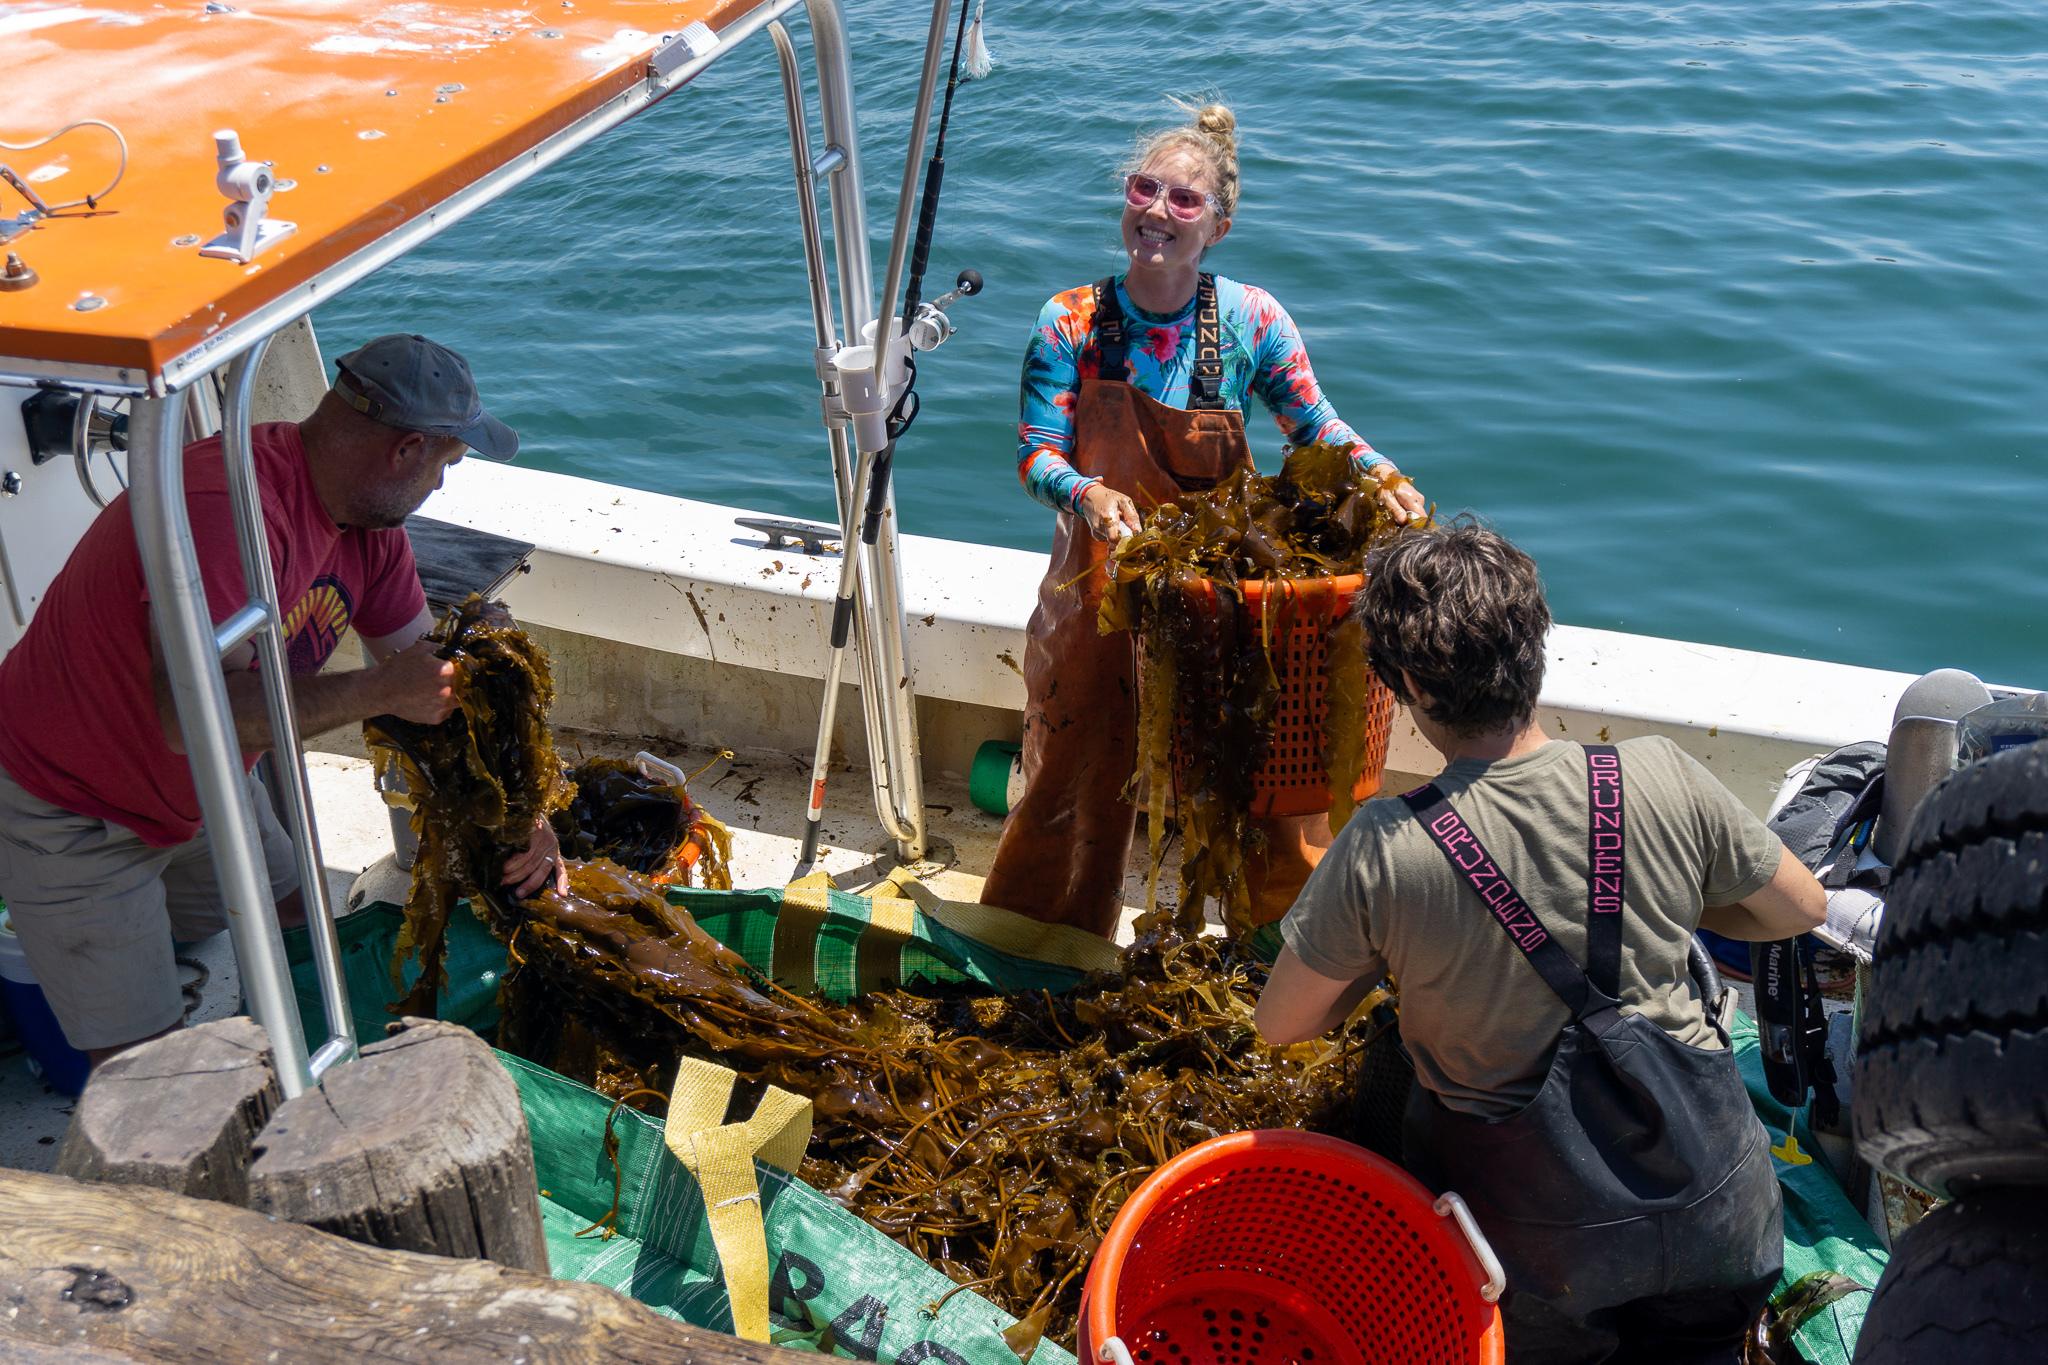 Kelp farmer Elizabeth Ellenwood and co-workers off-loading a fresh haul of sugar kelp to make fertilizer for the Montauk Seaweed Supply Company.